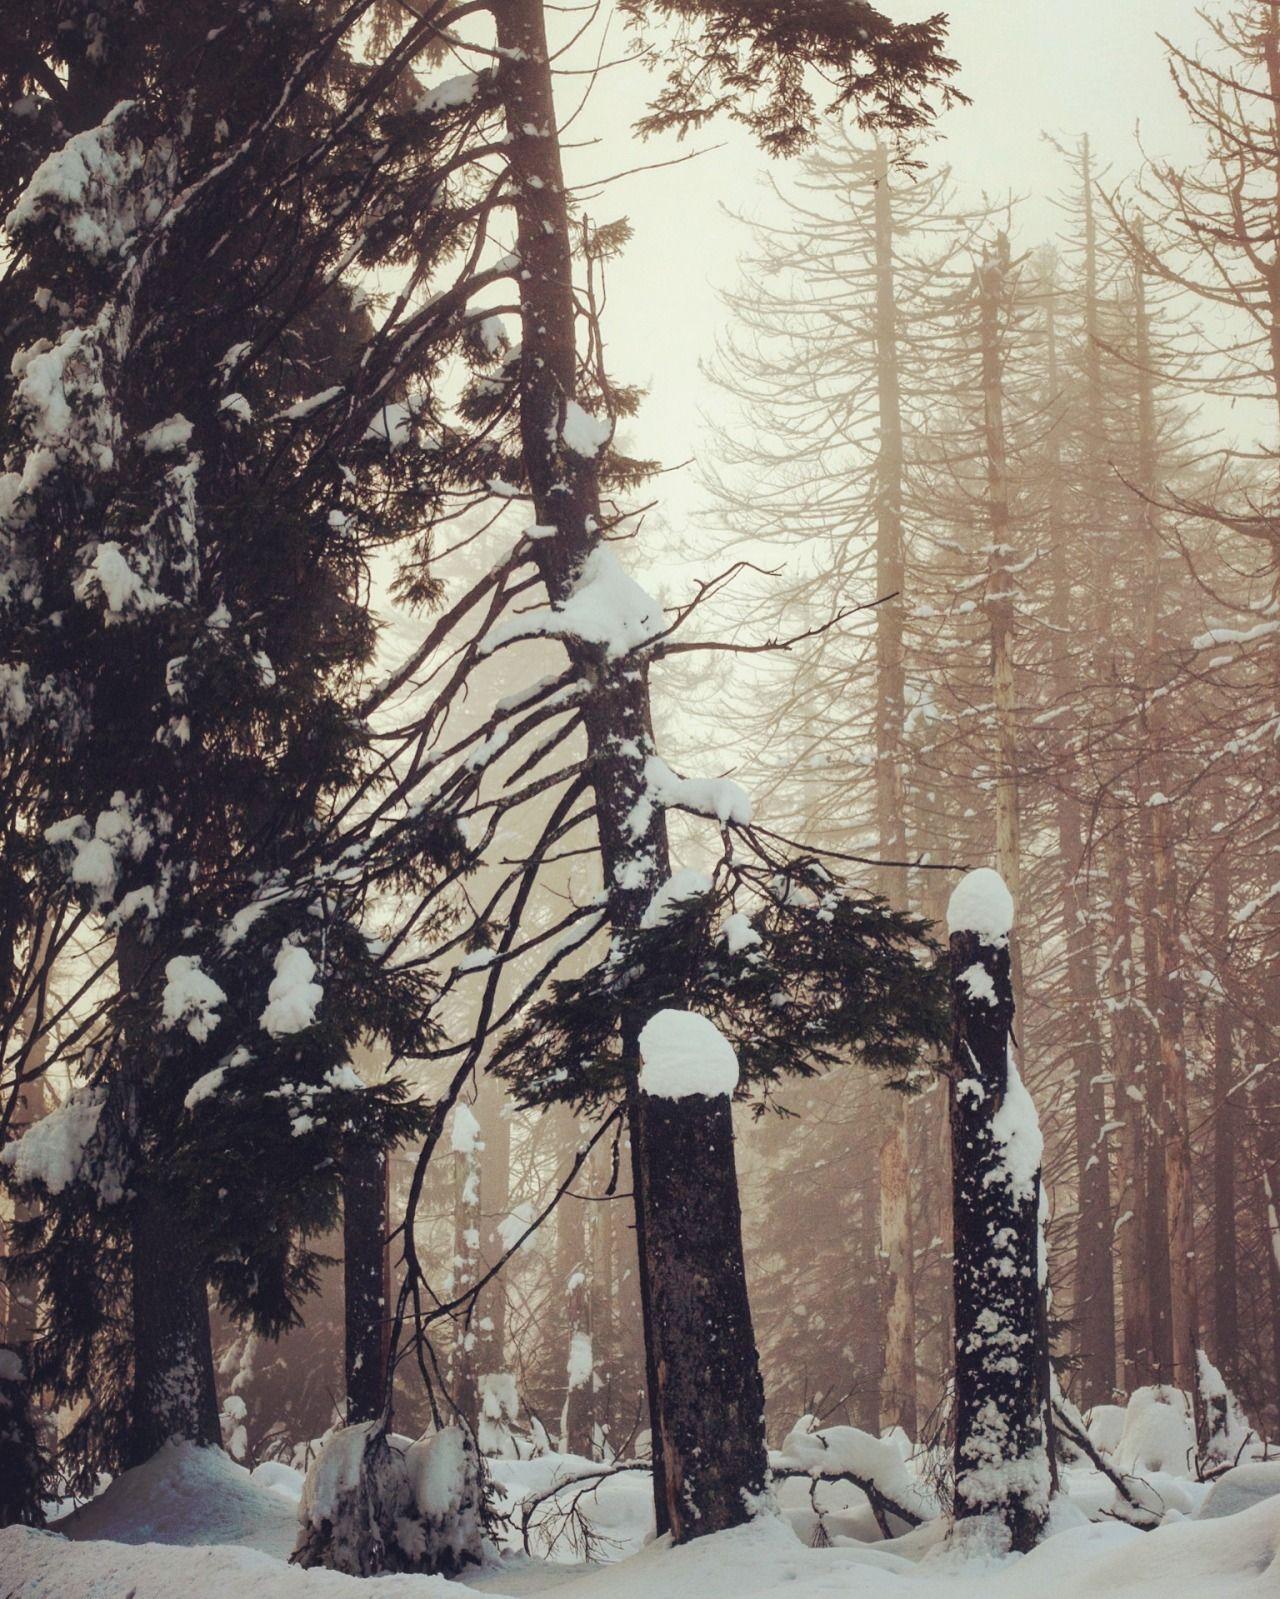 Snowy Heartsmountains by @noirerora - #artists #forest #harz #harzmountains #harzmystik #landscape #nature #noirerora #on #original #photographers #photography #snow #snowy #tumblr #winter #woods